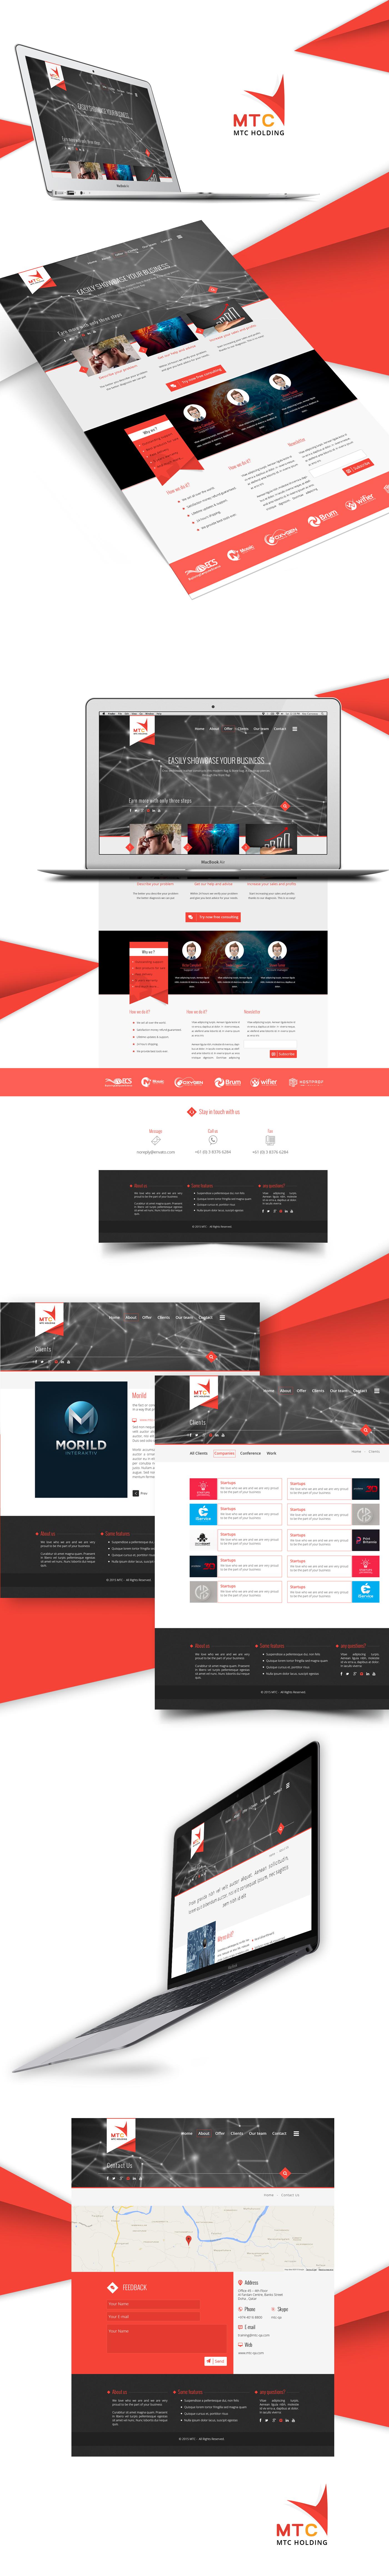 UI/UX Design forMTC Holding Company…